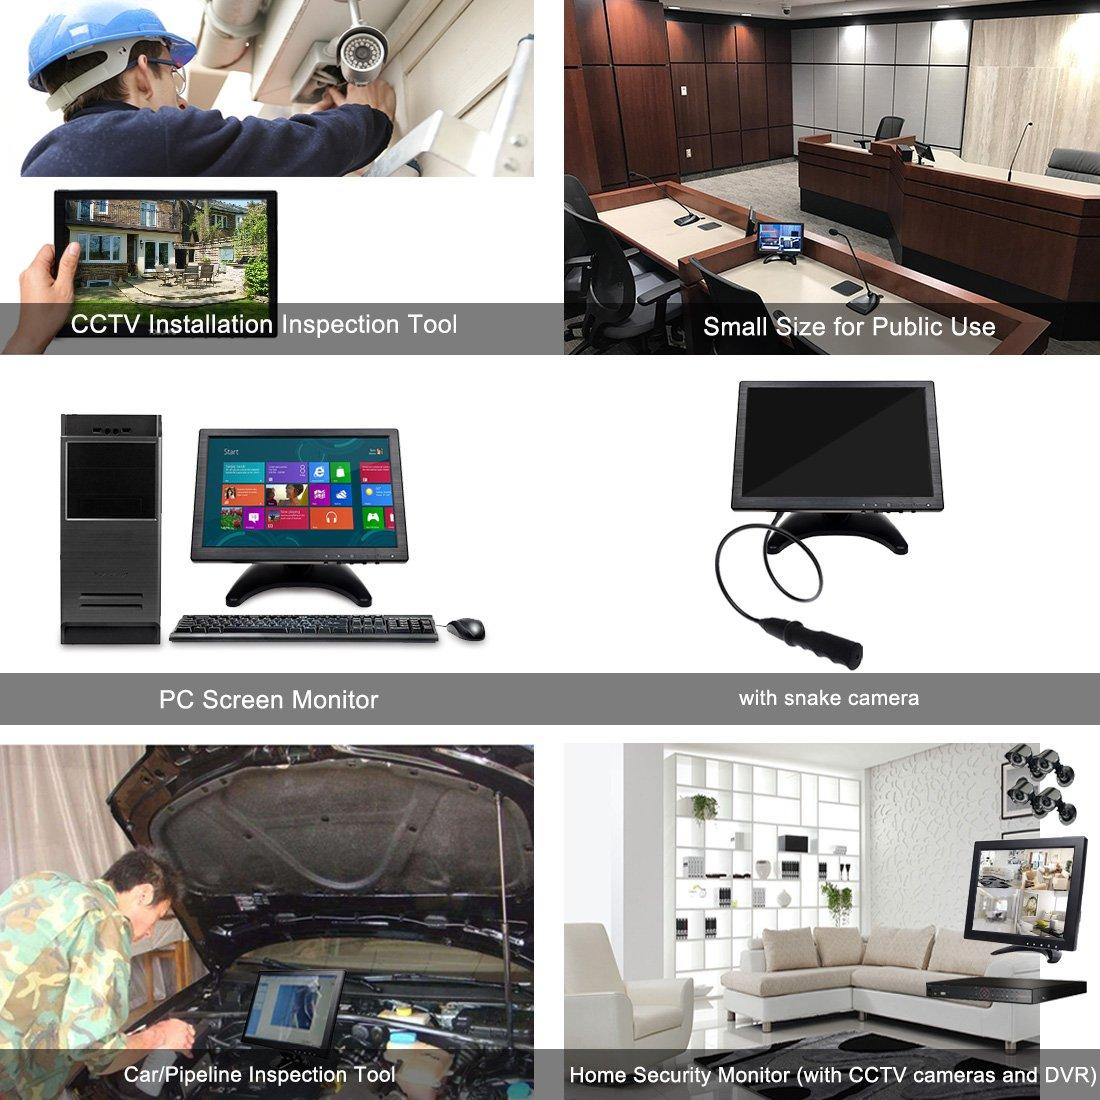 Toguard 101 Inch Portable Computer Monitor Hd Security 1280x800 Sumsung Ips Display With Usb Vga Hdmi Av Bnc Input Earphone Speaker